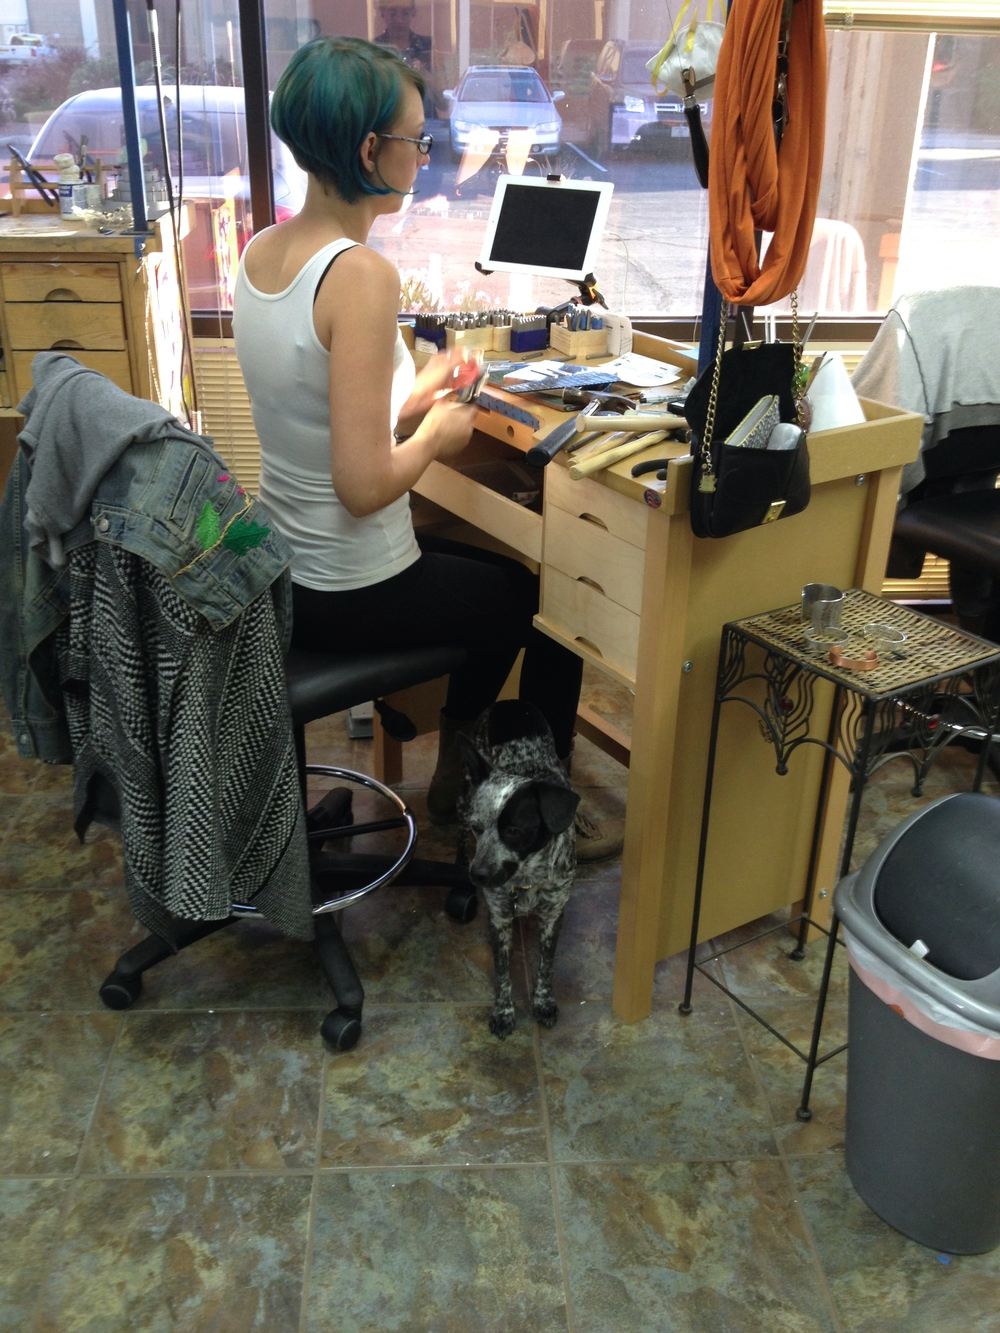 cassie at her work bench, a moondog at her feet.